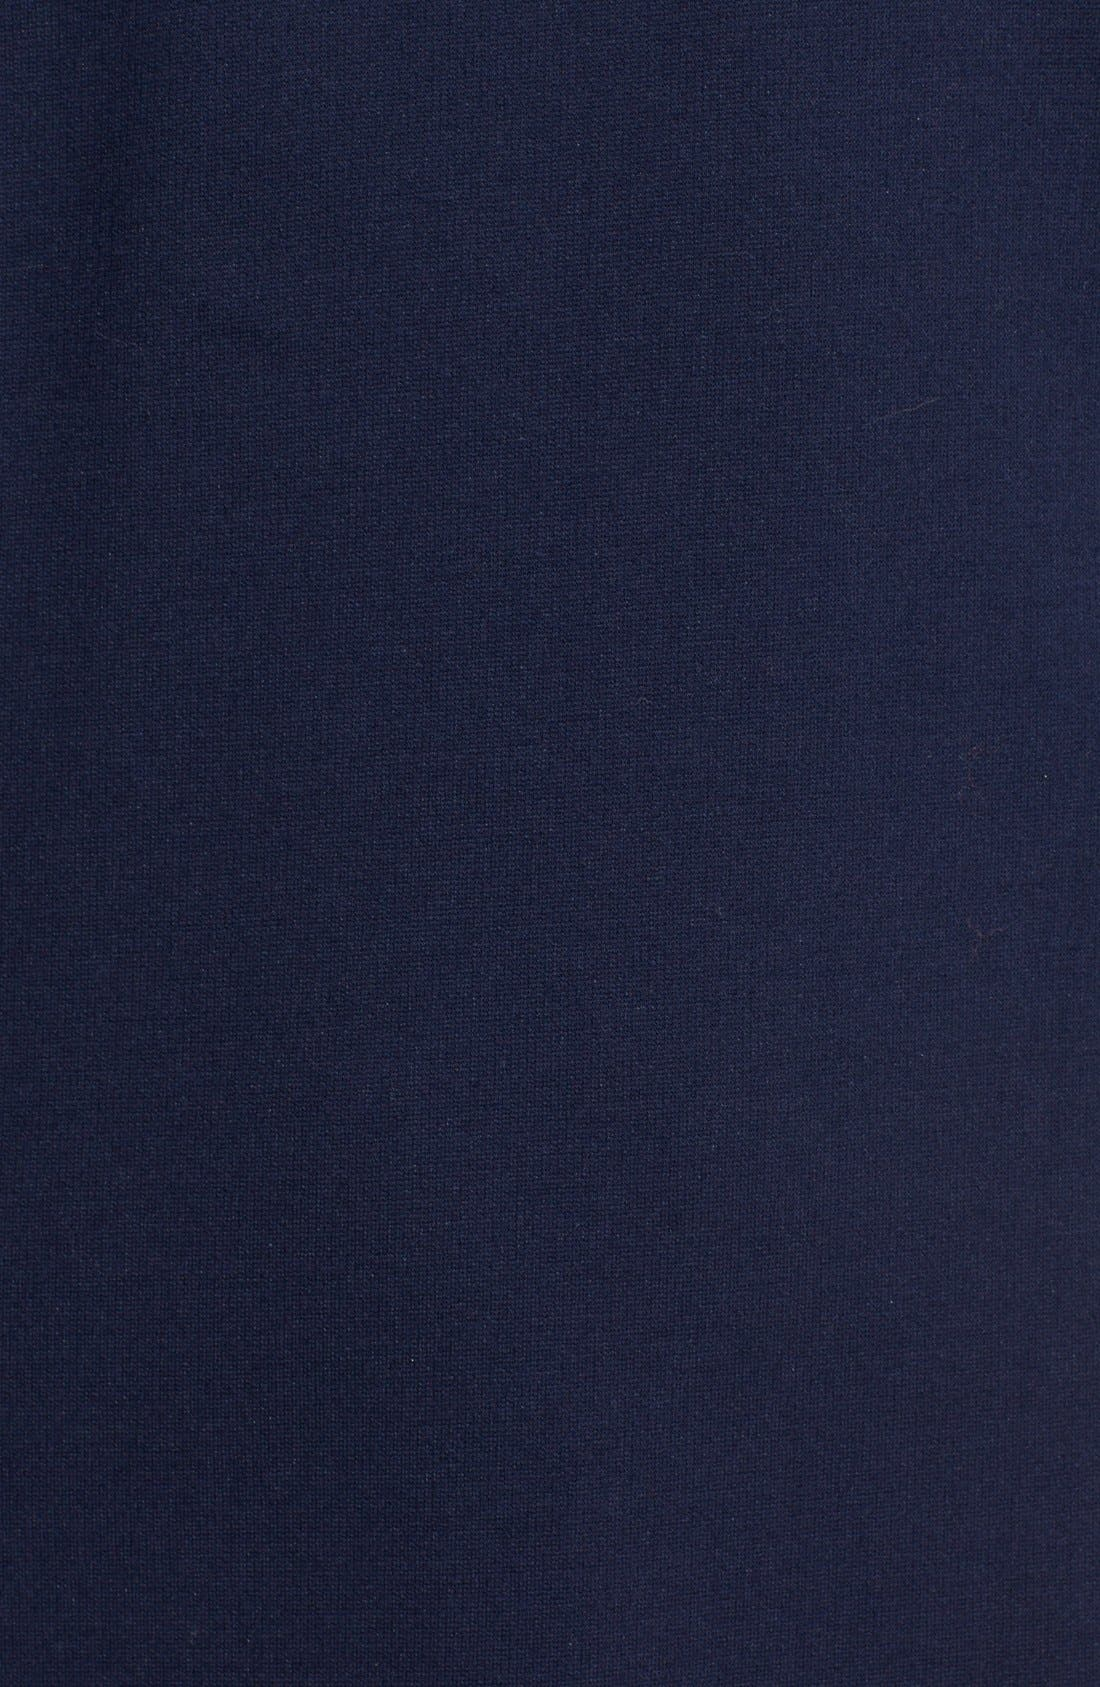 'Eelah' Embellished Collar Shift Dress,                             Alternate thumbnail 2, color,                             421